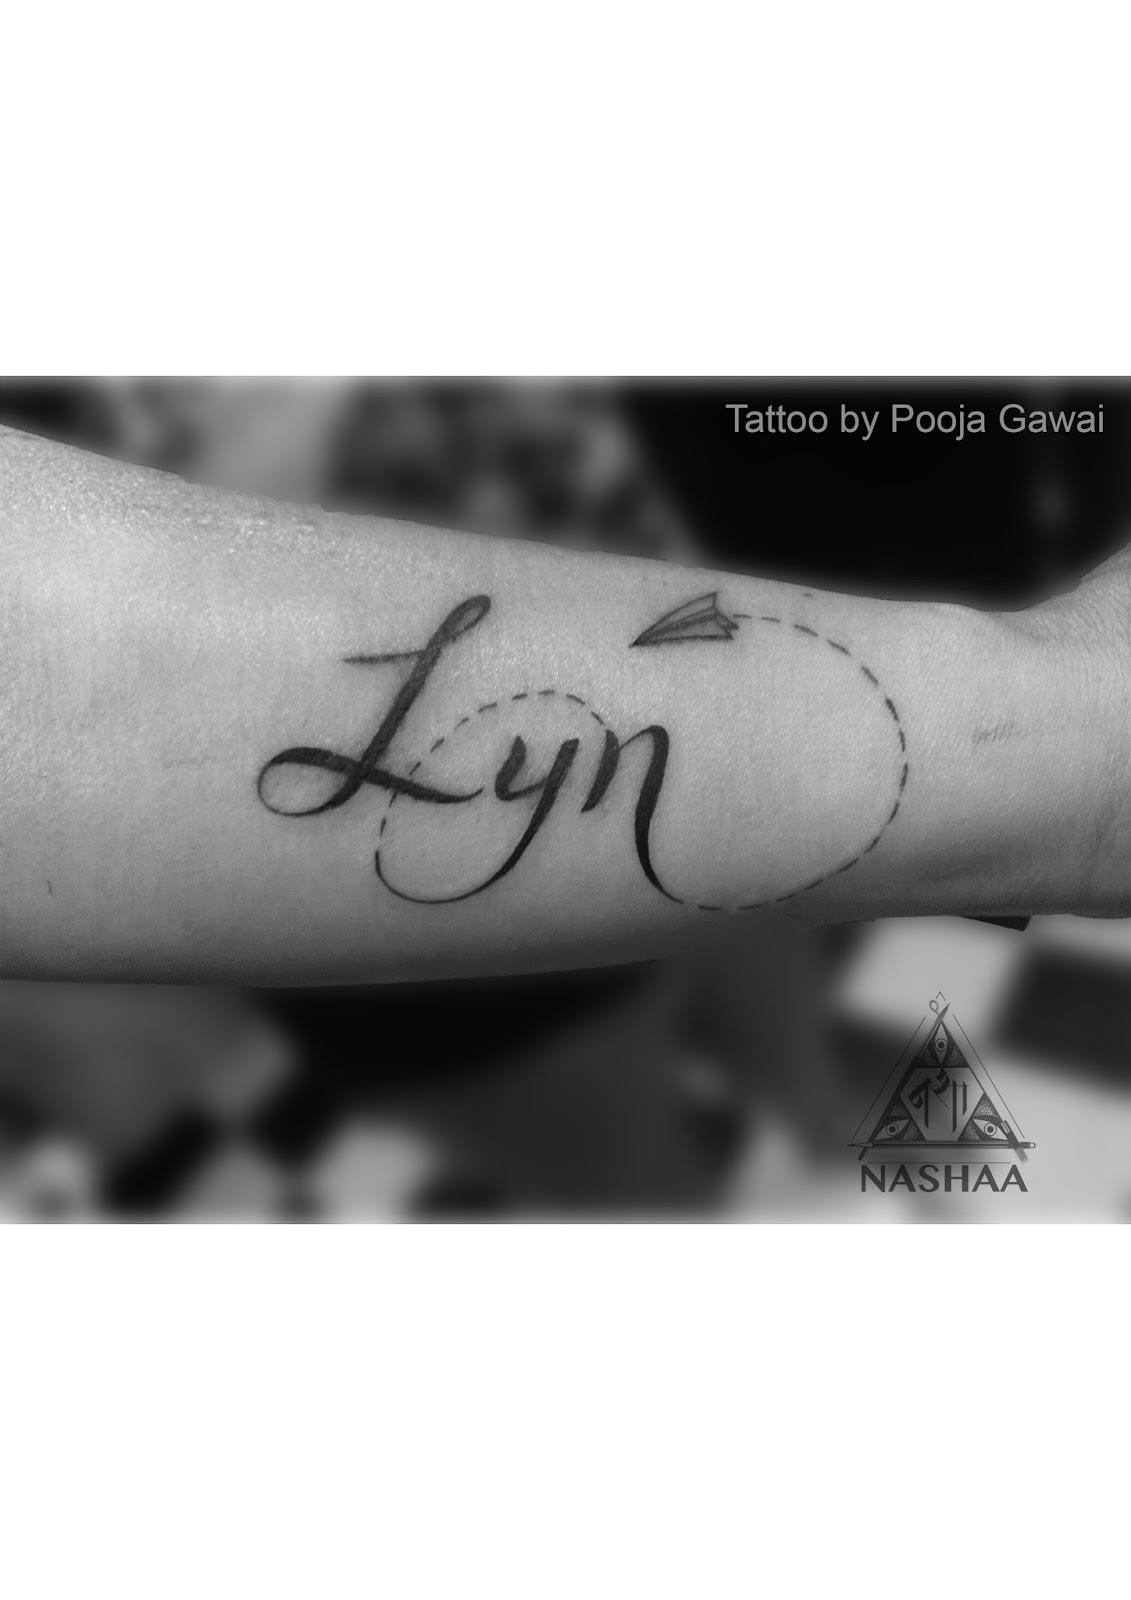 Tattoos In Mumbai Small Name Tattoo Done By Pooja Gawai Nashaa